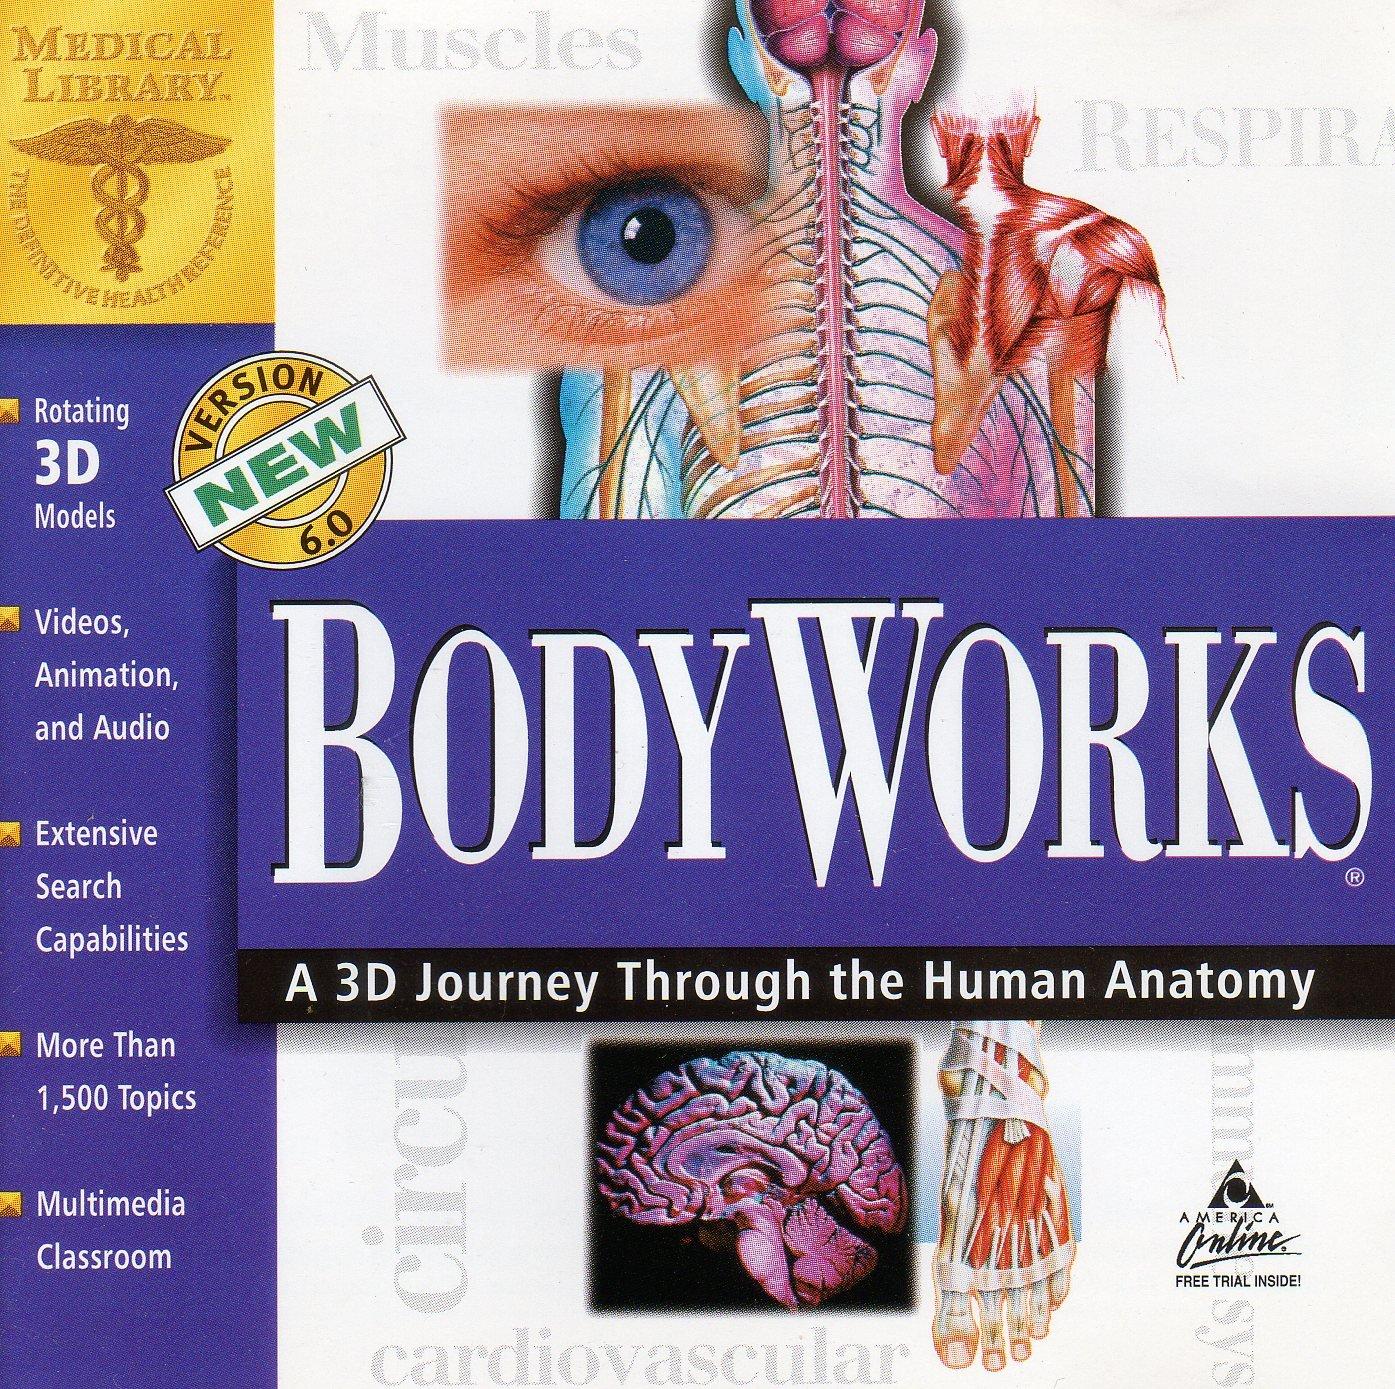 Amazon.com: Body Works: A 3D Journey Through the Human Anatomy ...